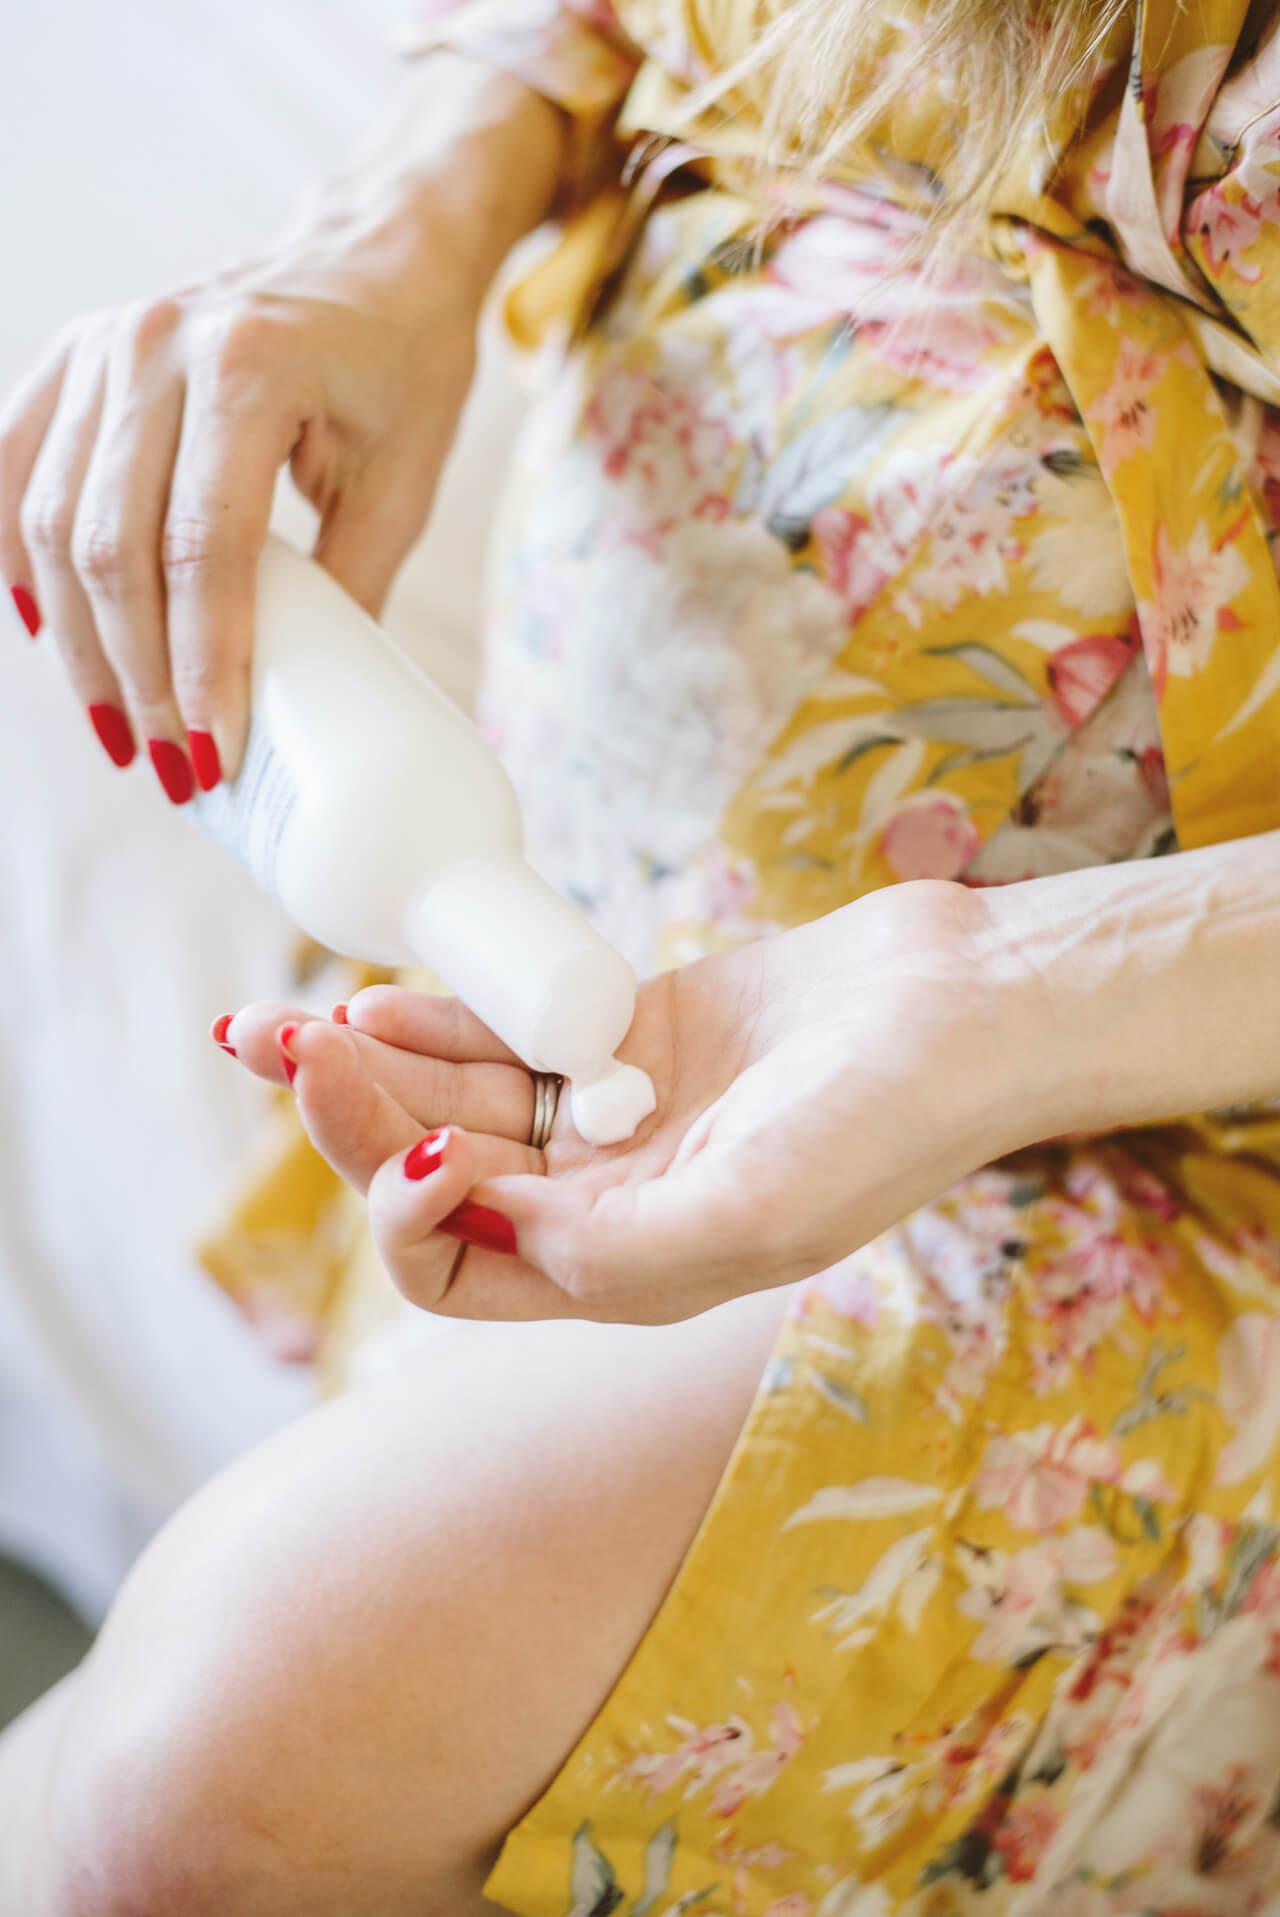 nuskin intense body moisturizer